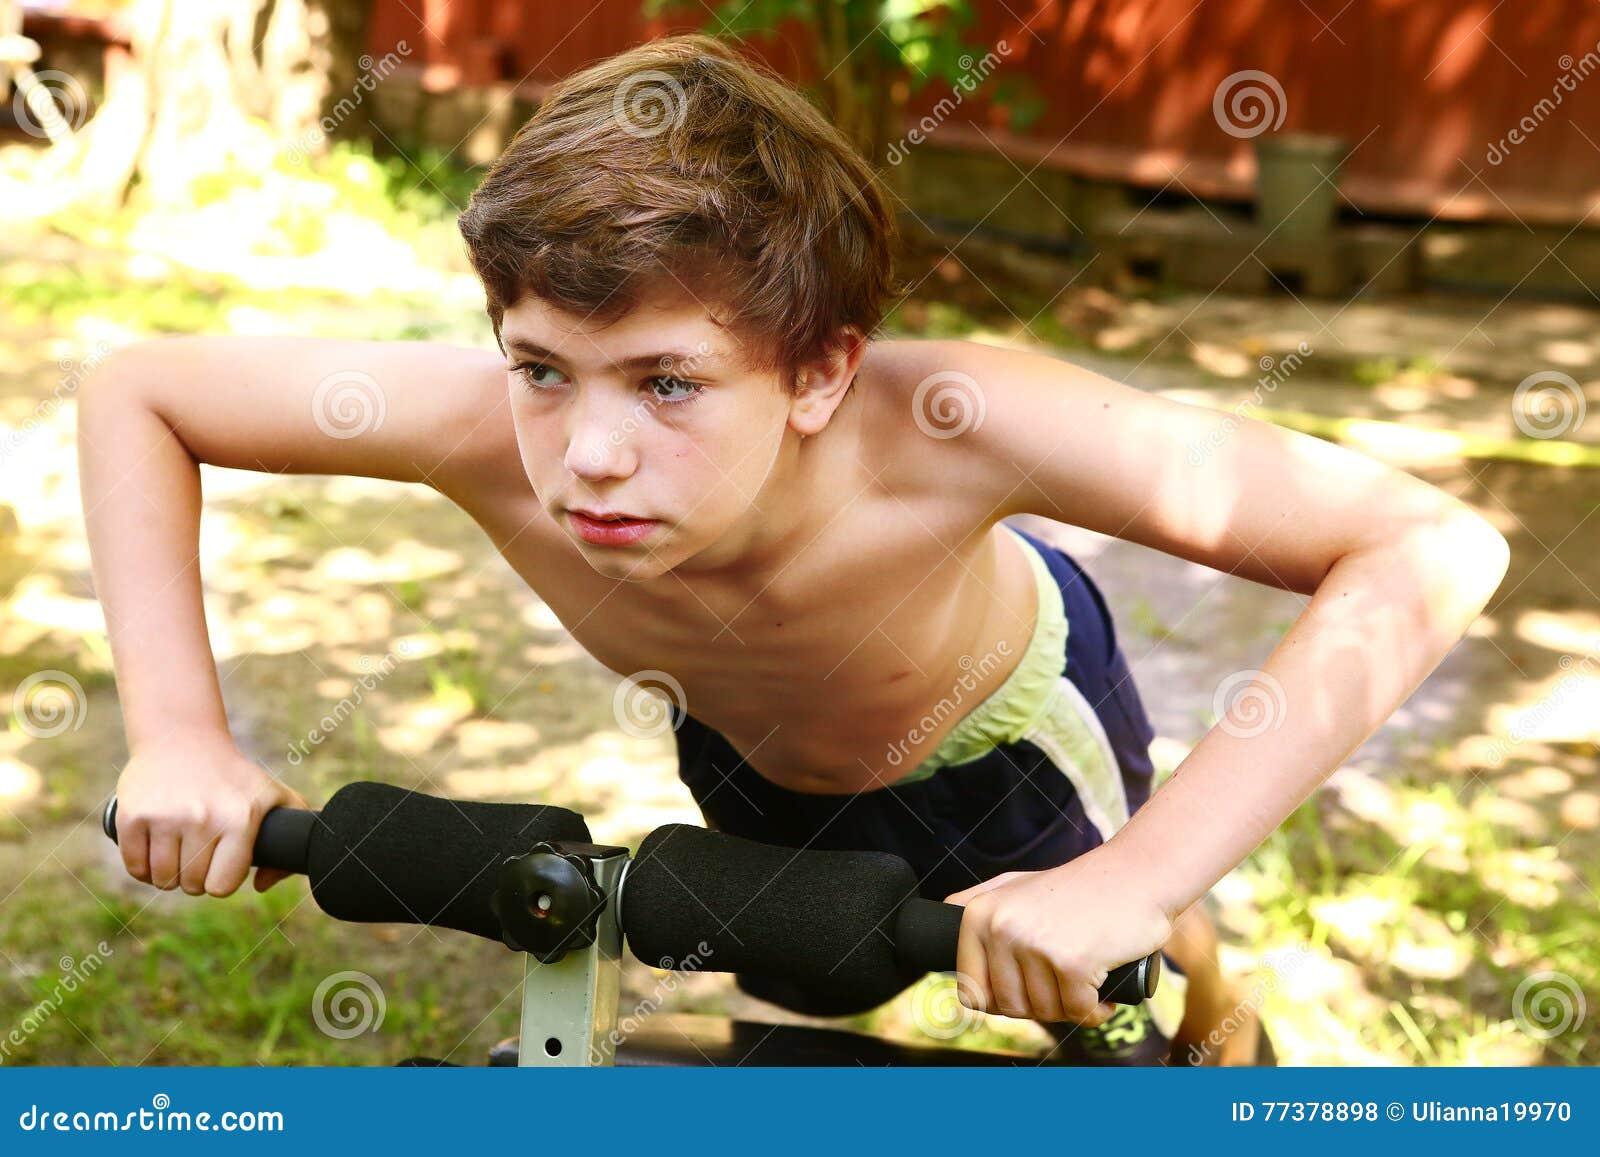 Boobs Preten Nude Boys Pics Scenes